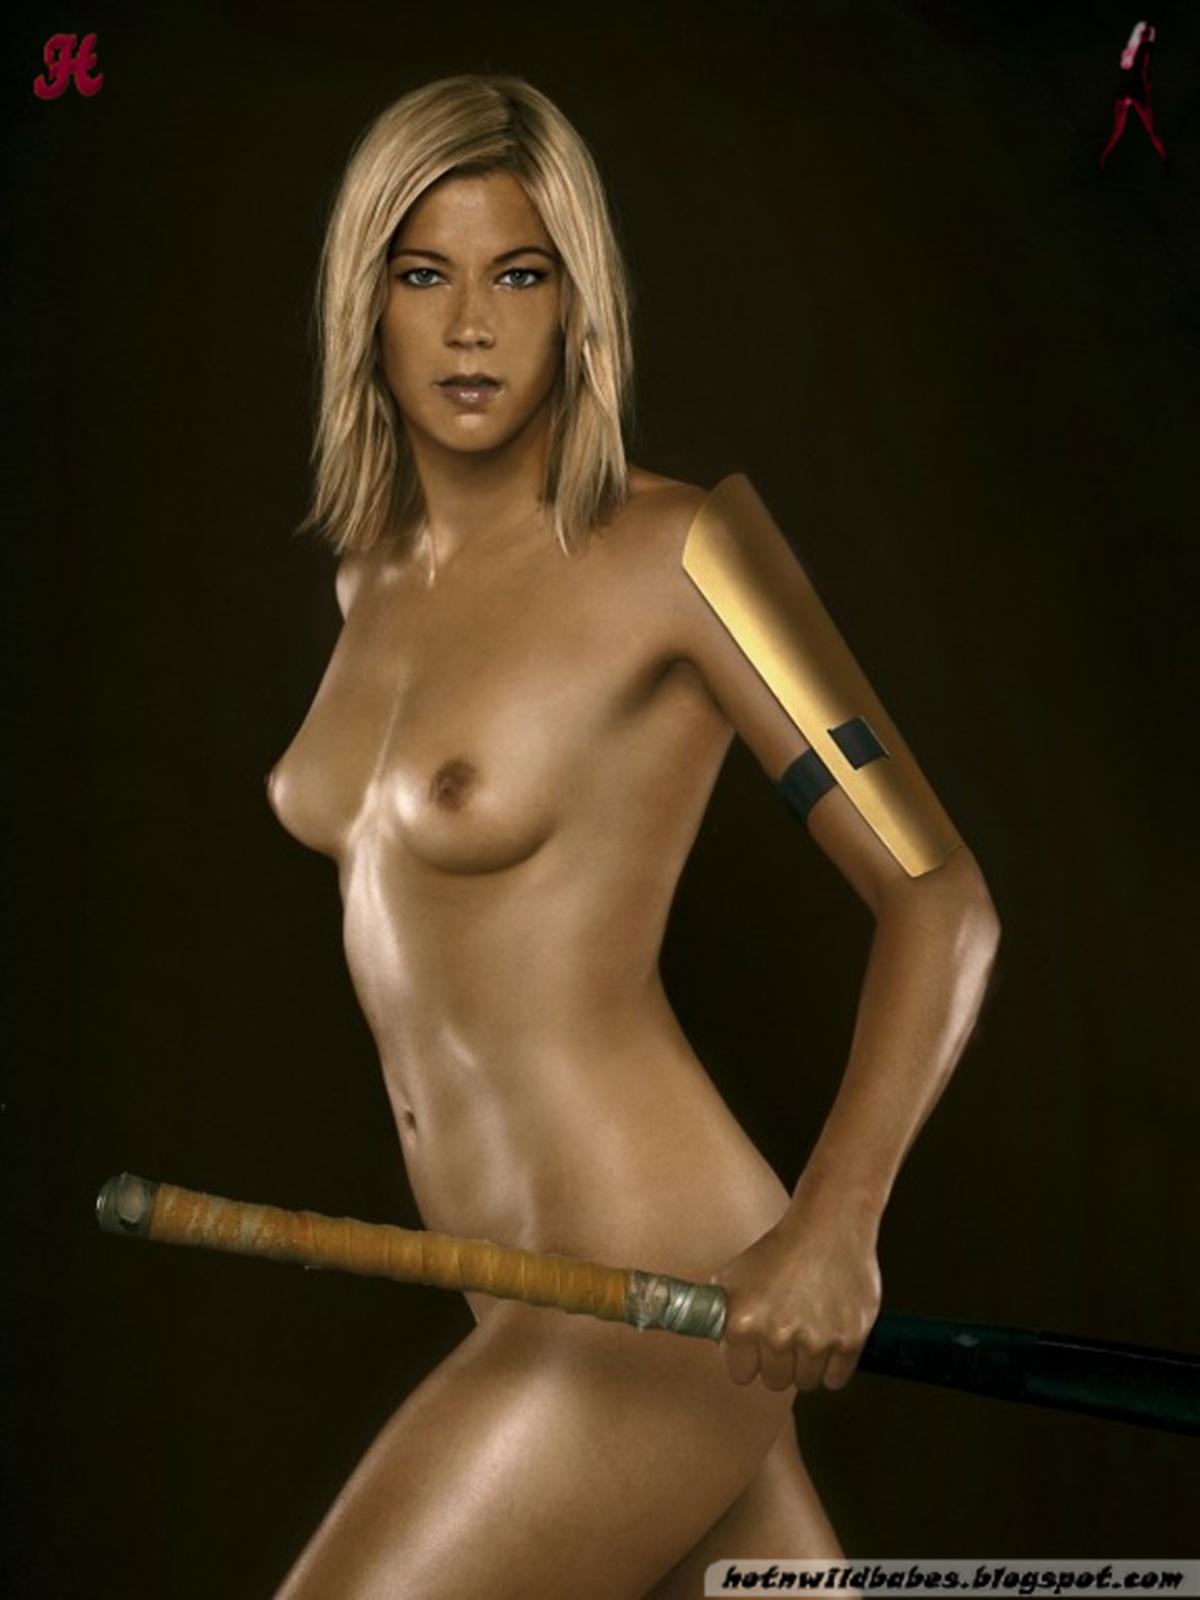 Women players nude hockey naked